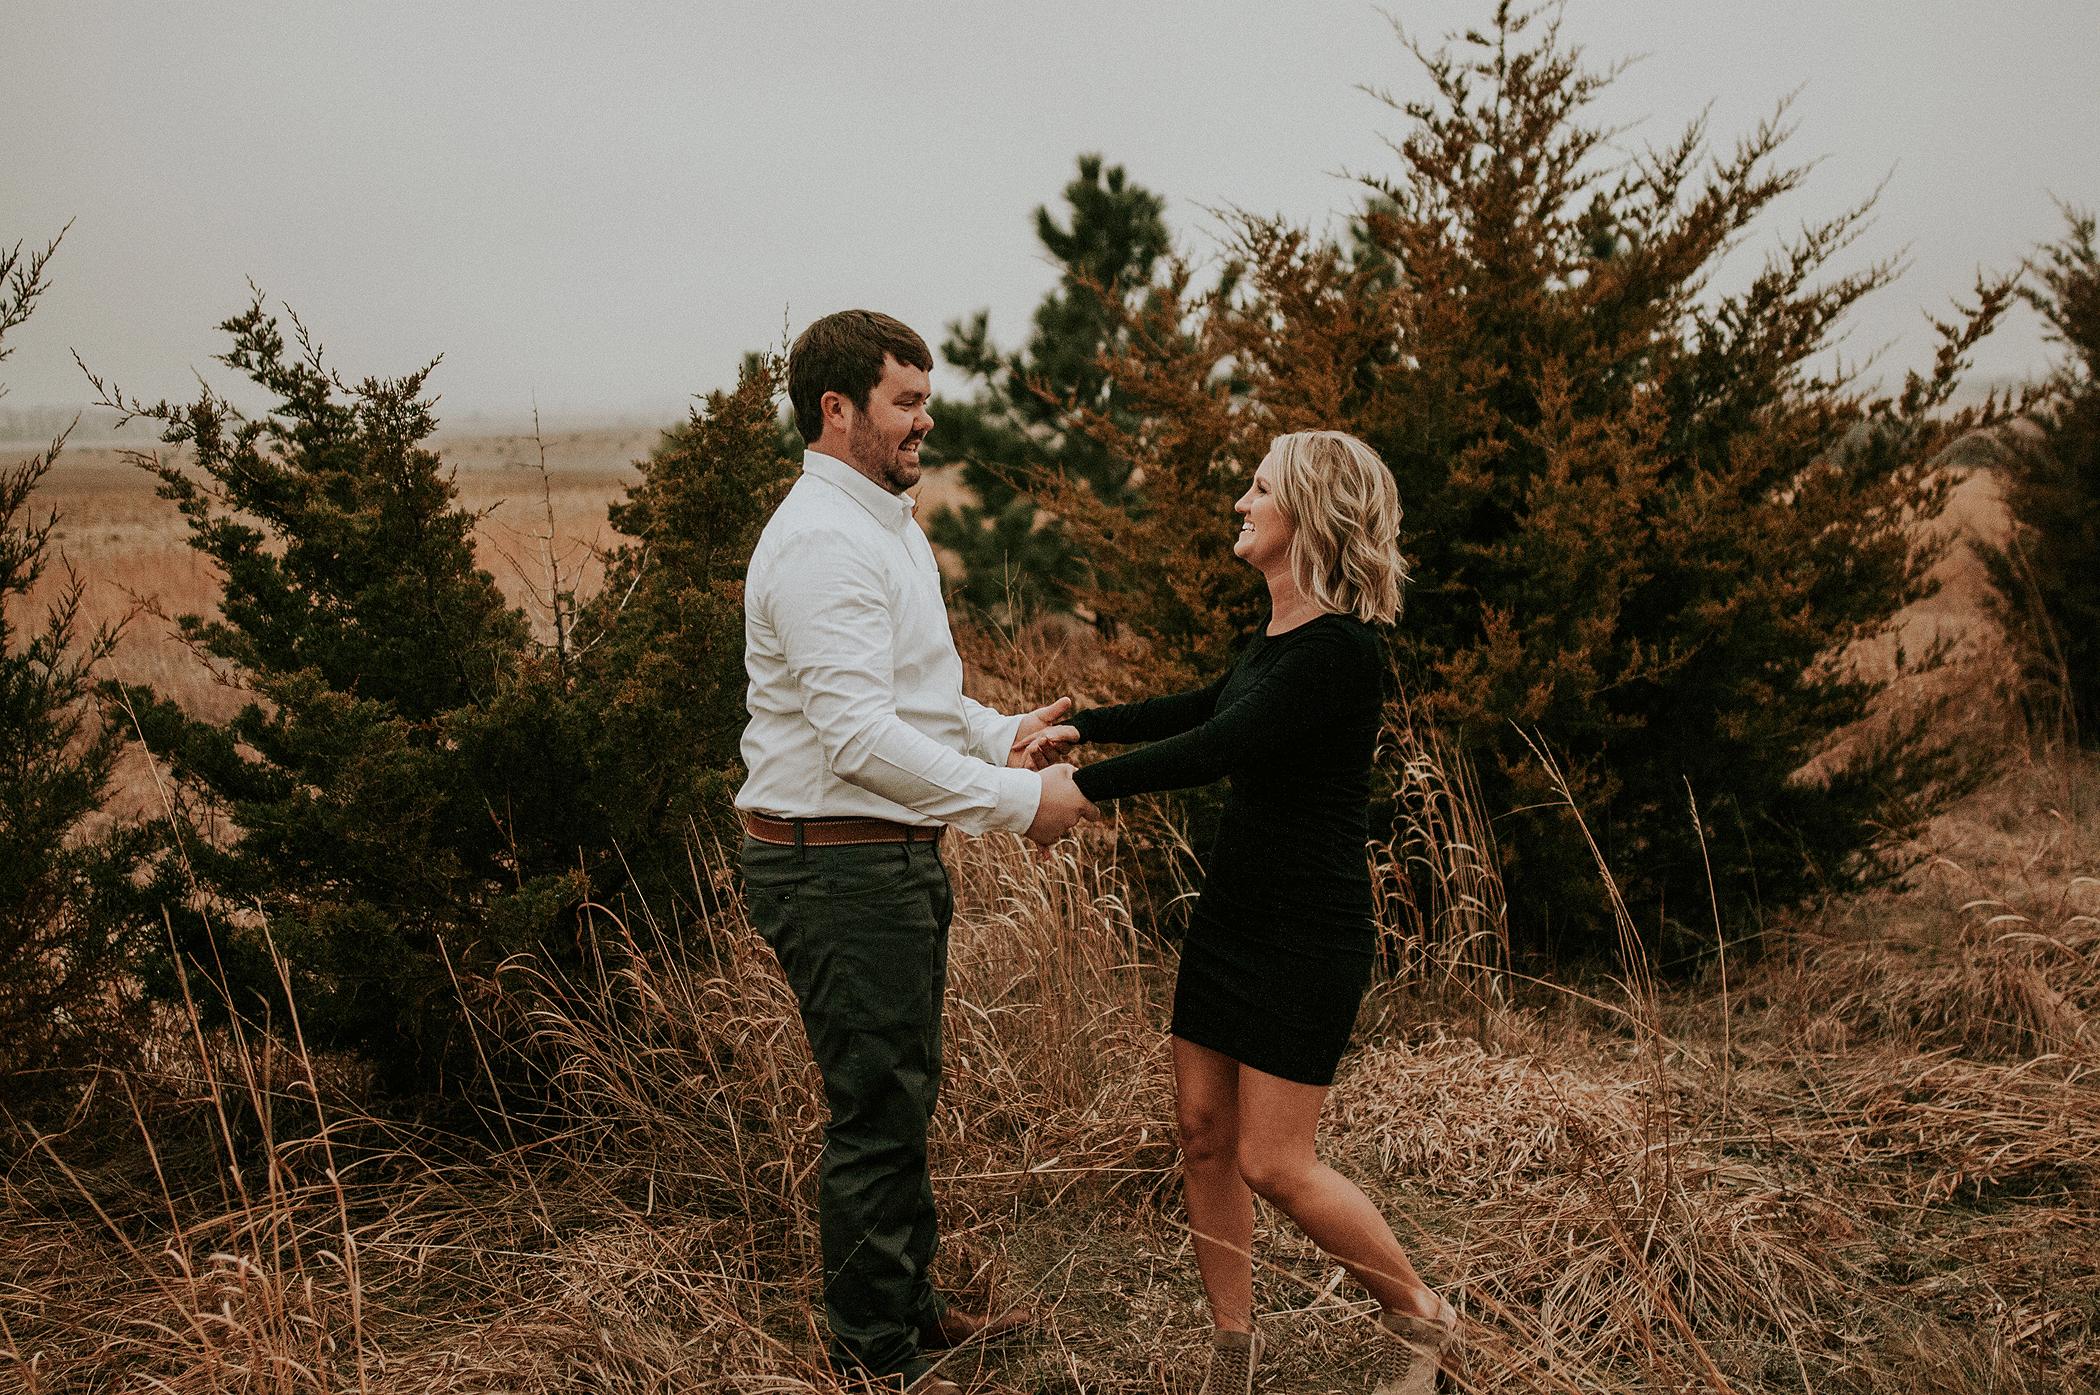 kaylie-sirek-nebraska-wedding-engagement-photographer-photography-grand-island-kearney-hastings-lincoln-33.png